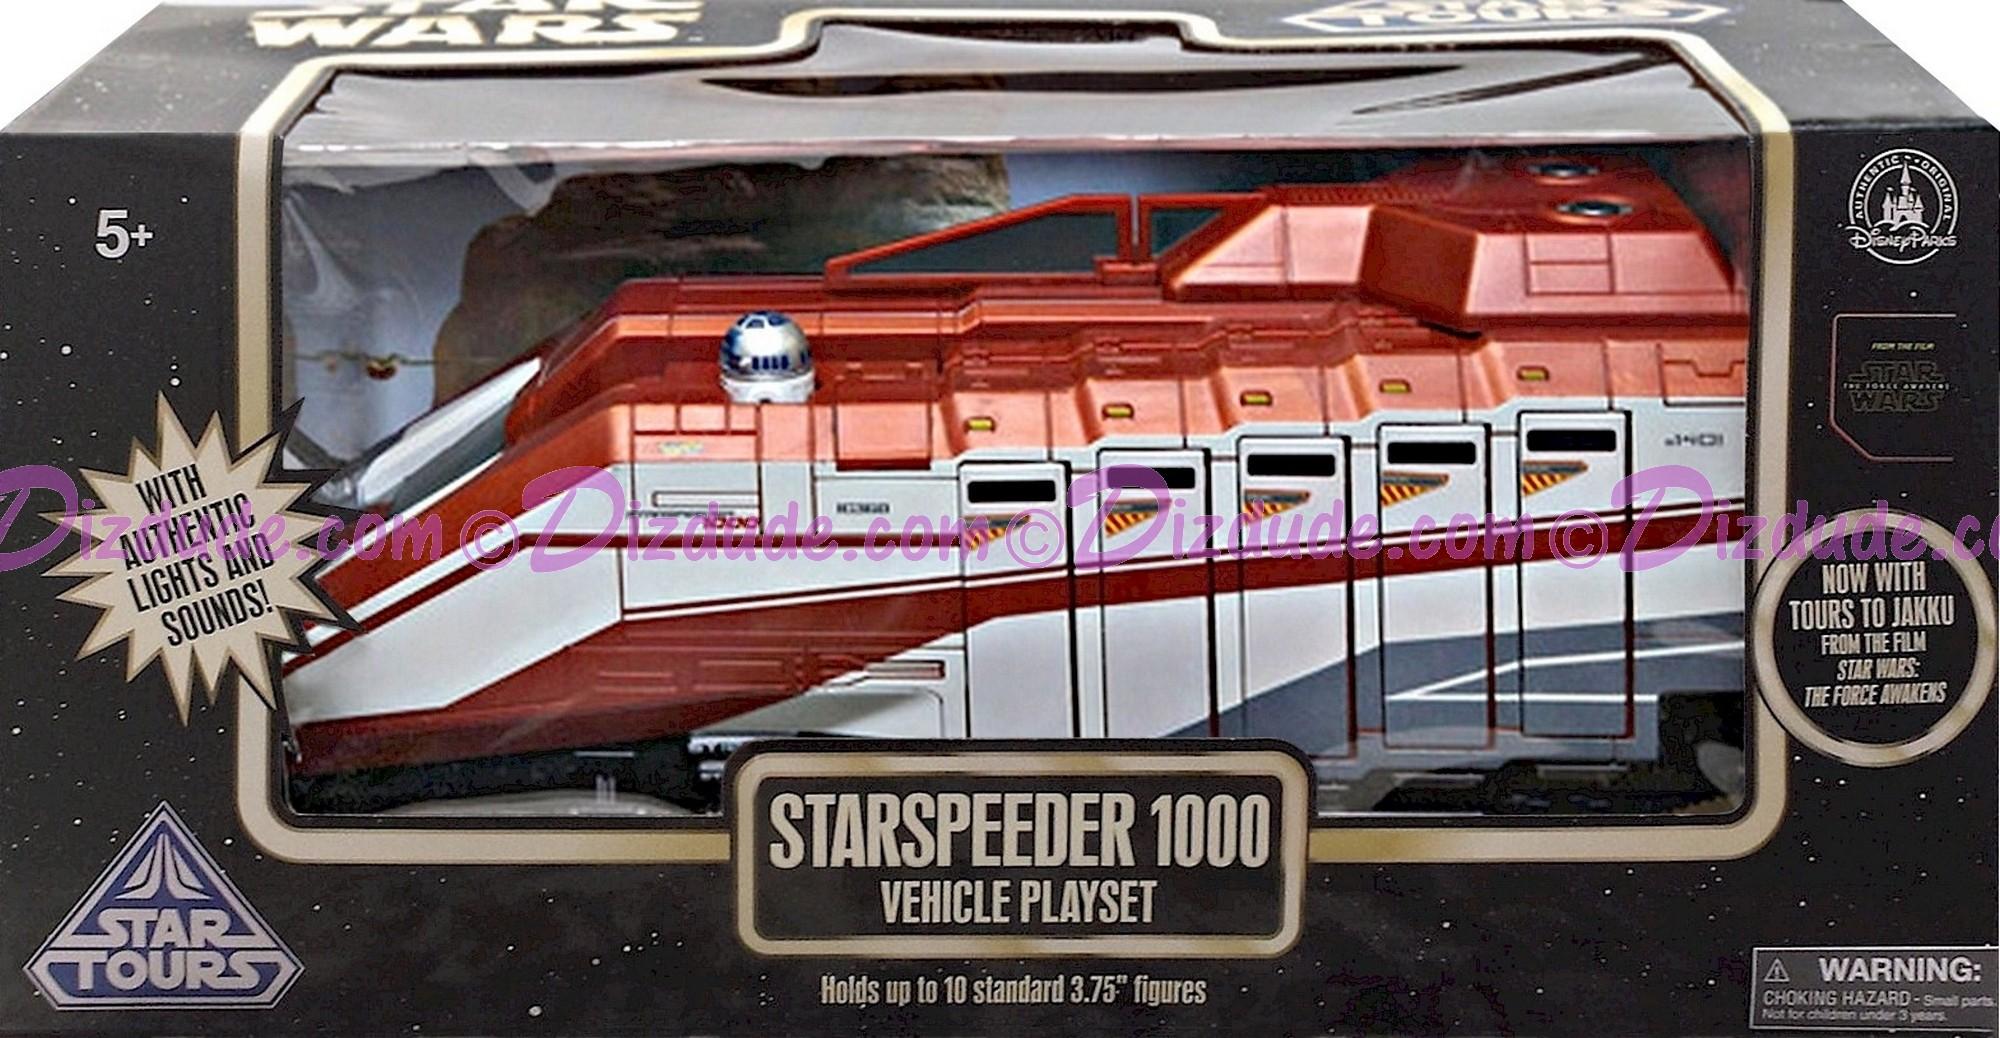 Star Tours / Star Wars StarSpeeder 1000 Vehicle Playset - Disney Star Wars: The Force Awakens ~ Jakku © Dizdude.com